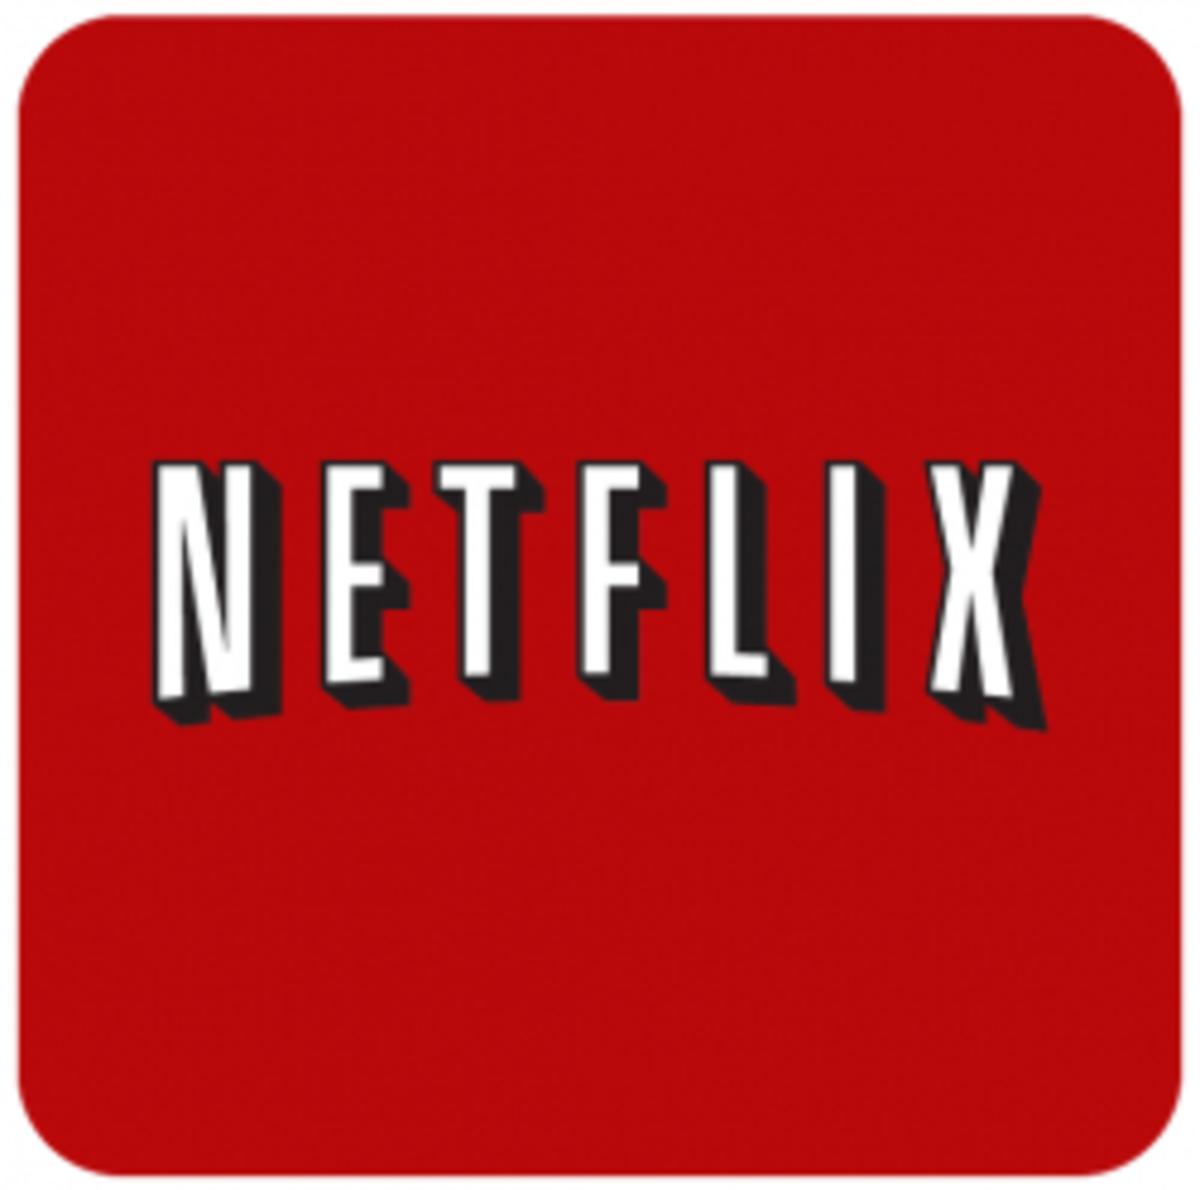 8 Sites Like Netflix - Try These Netflix Alternatives